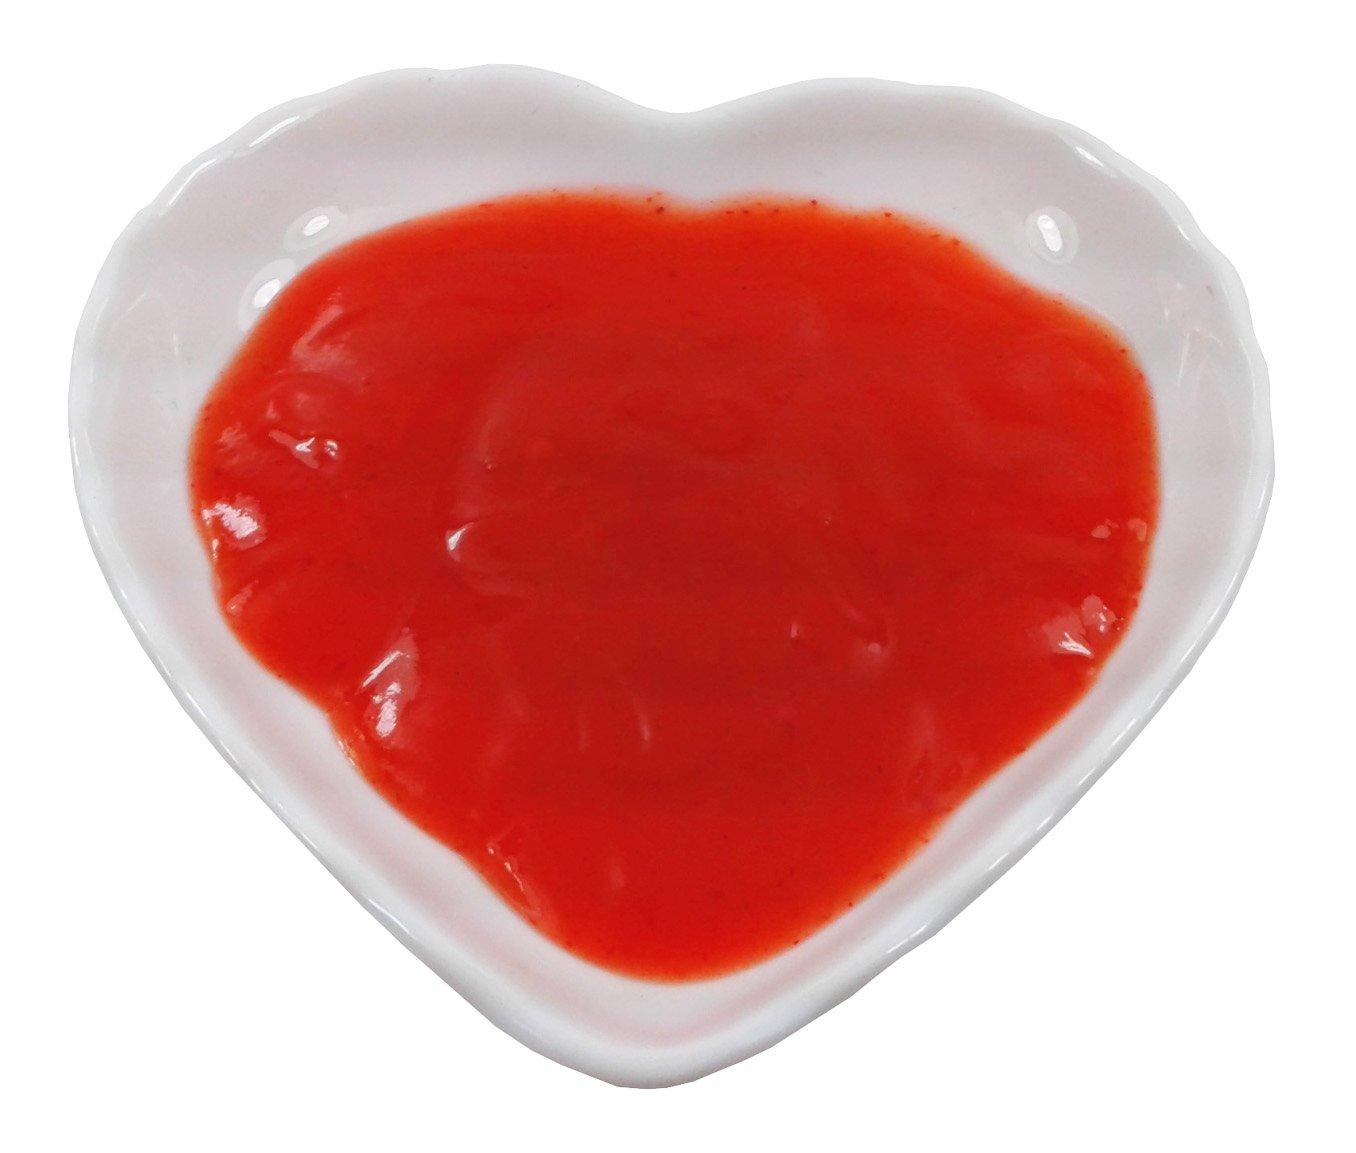 Super White Heart Shape Small Wavy Edge Porcelain Sauce Dish (12 Count)